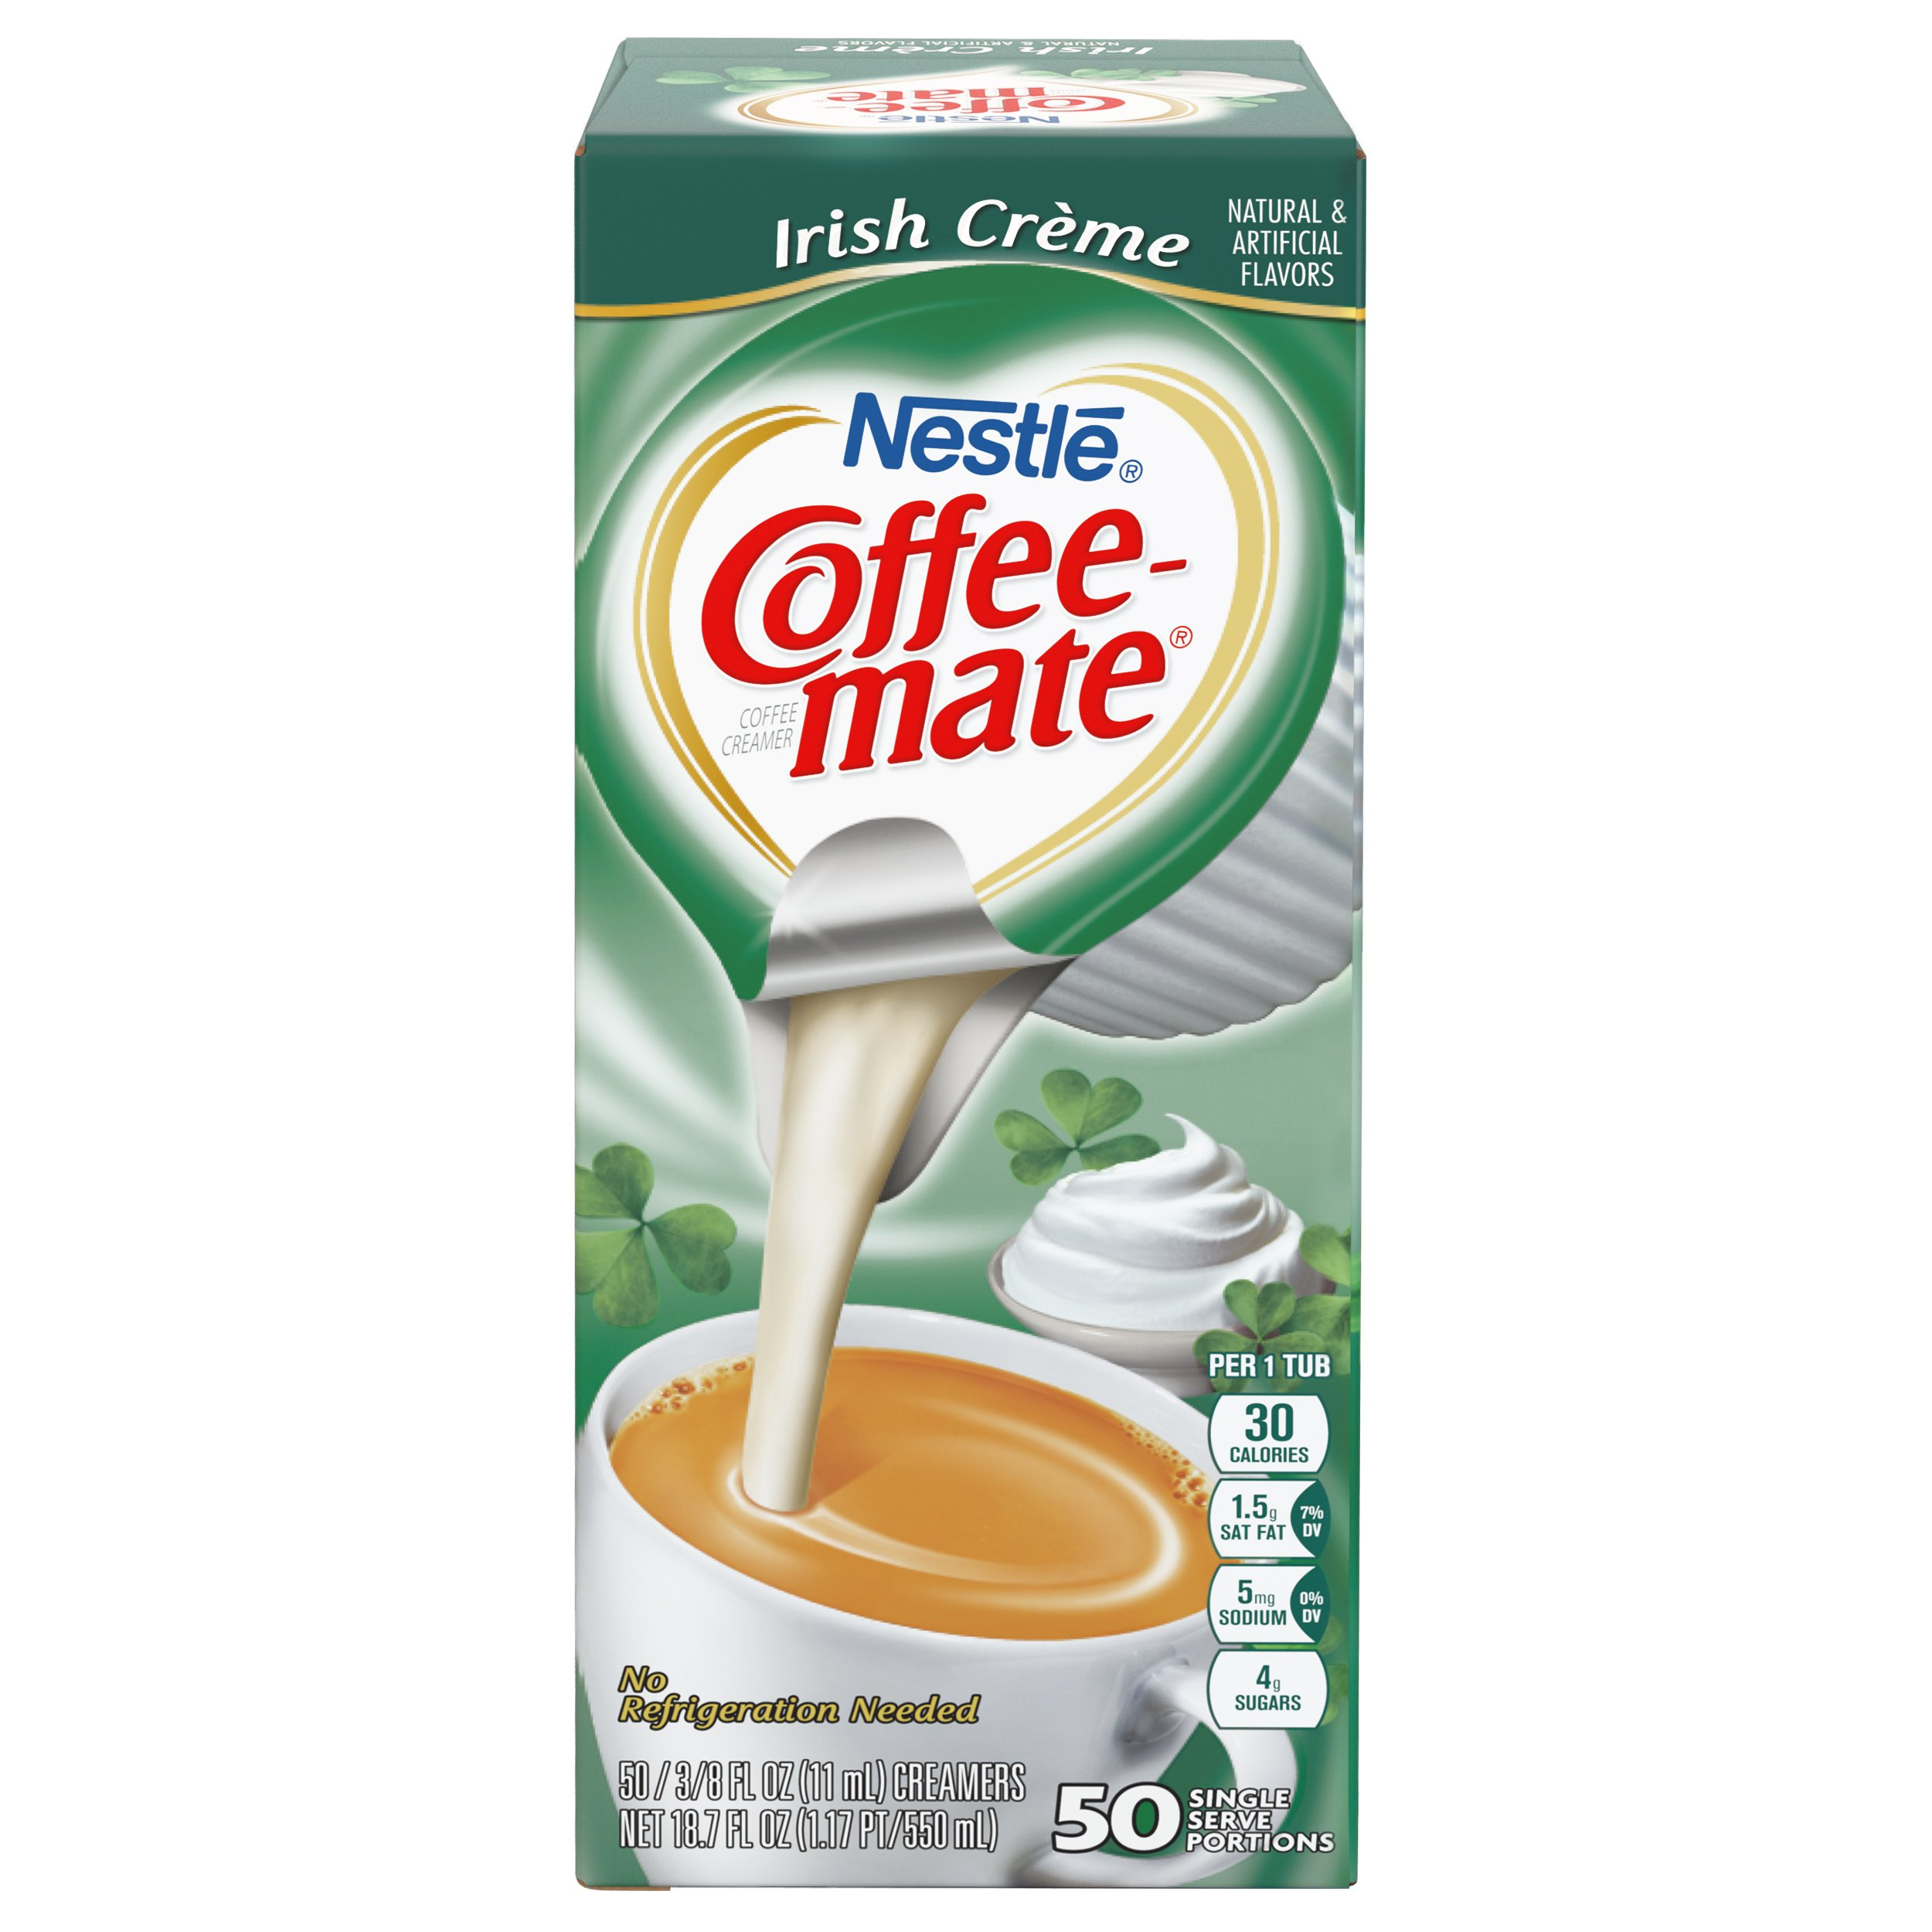 NESTLE COFFEE-MATE Coffee Creamer, Irish Creme, liquid creamer singles, Pack of 200 by Nestle Coffee Mate (Image #4)